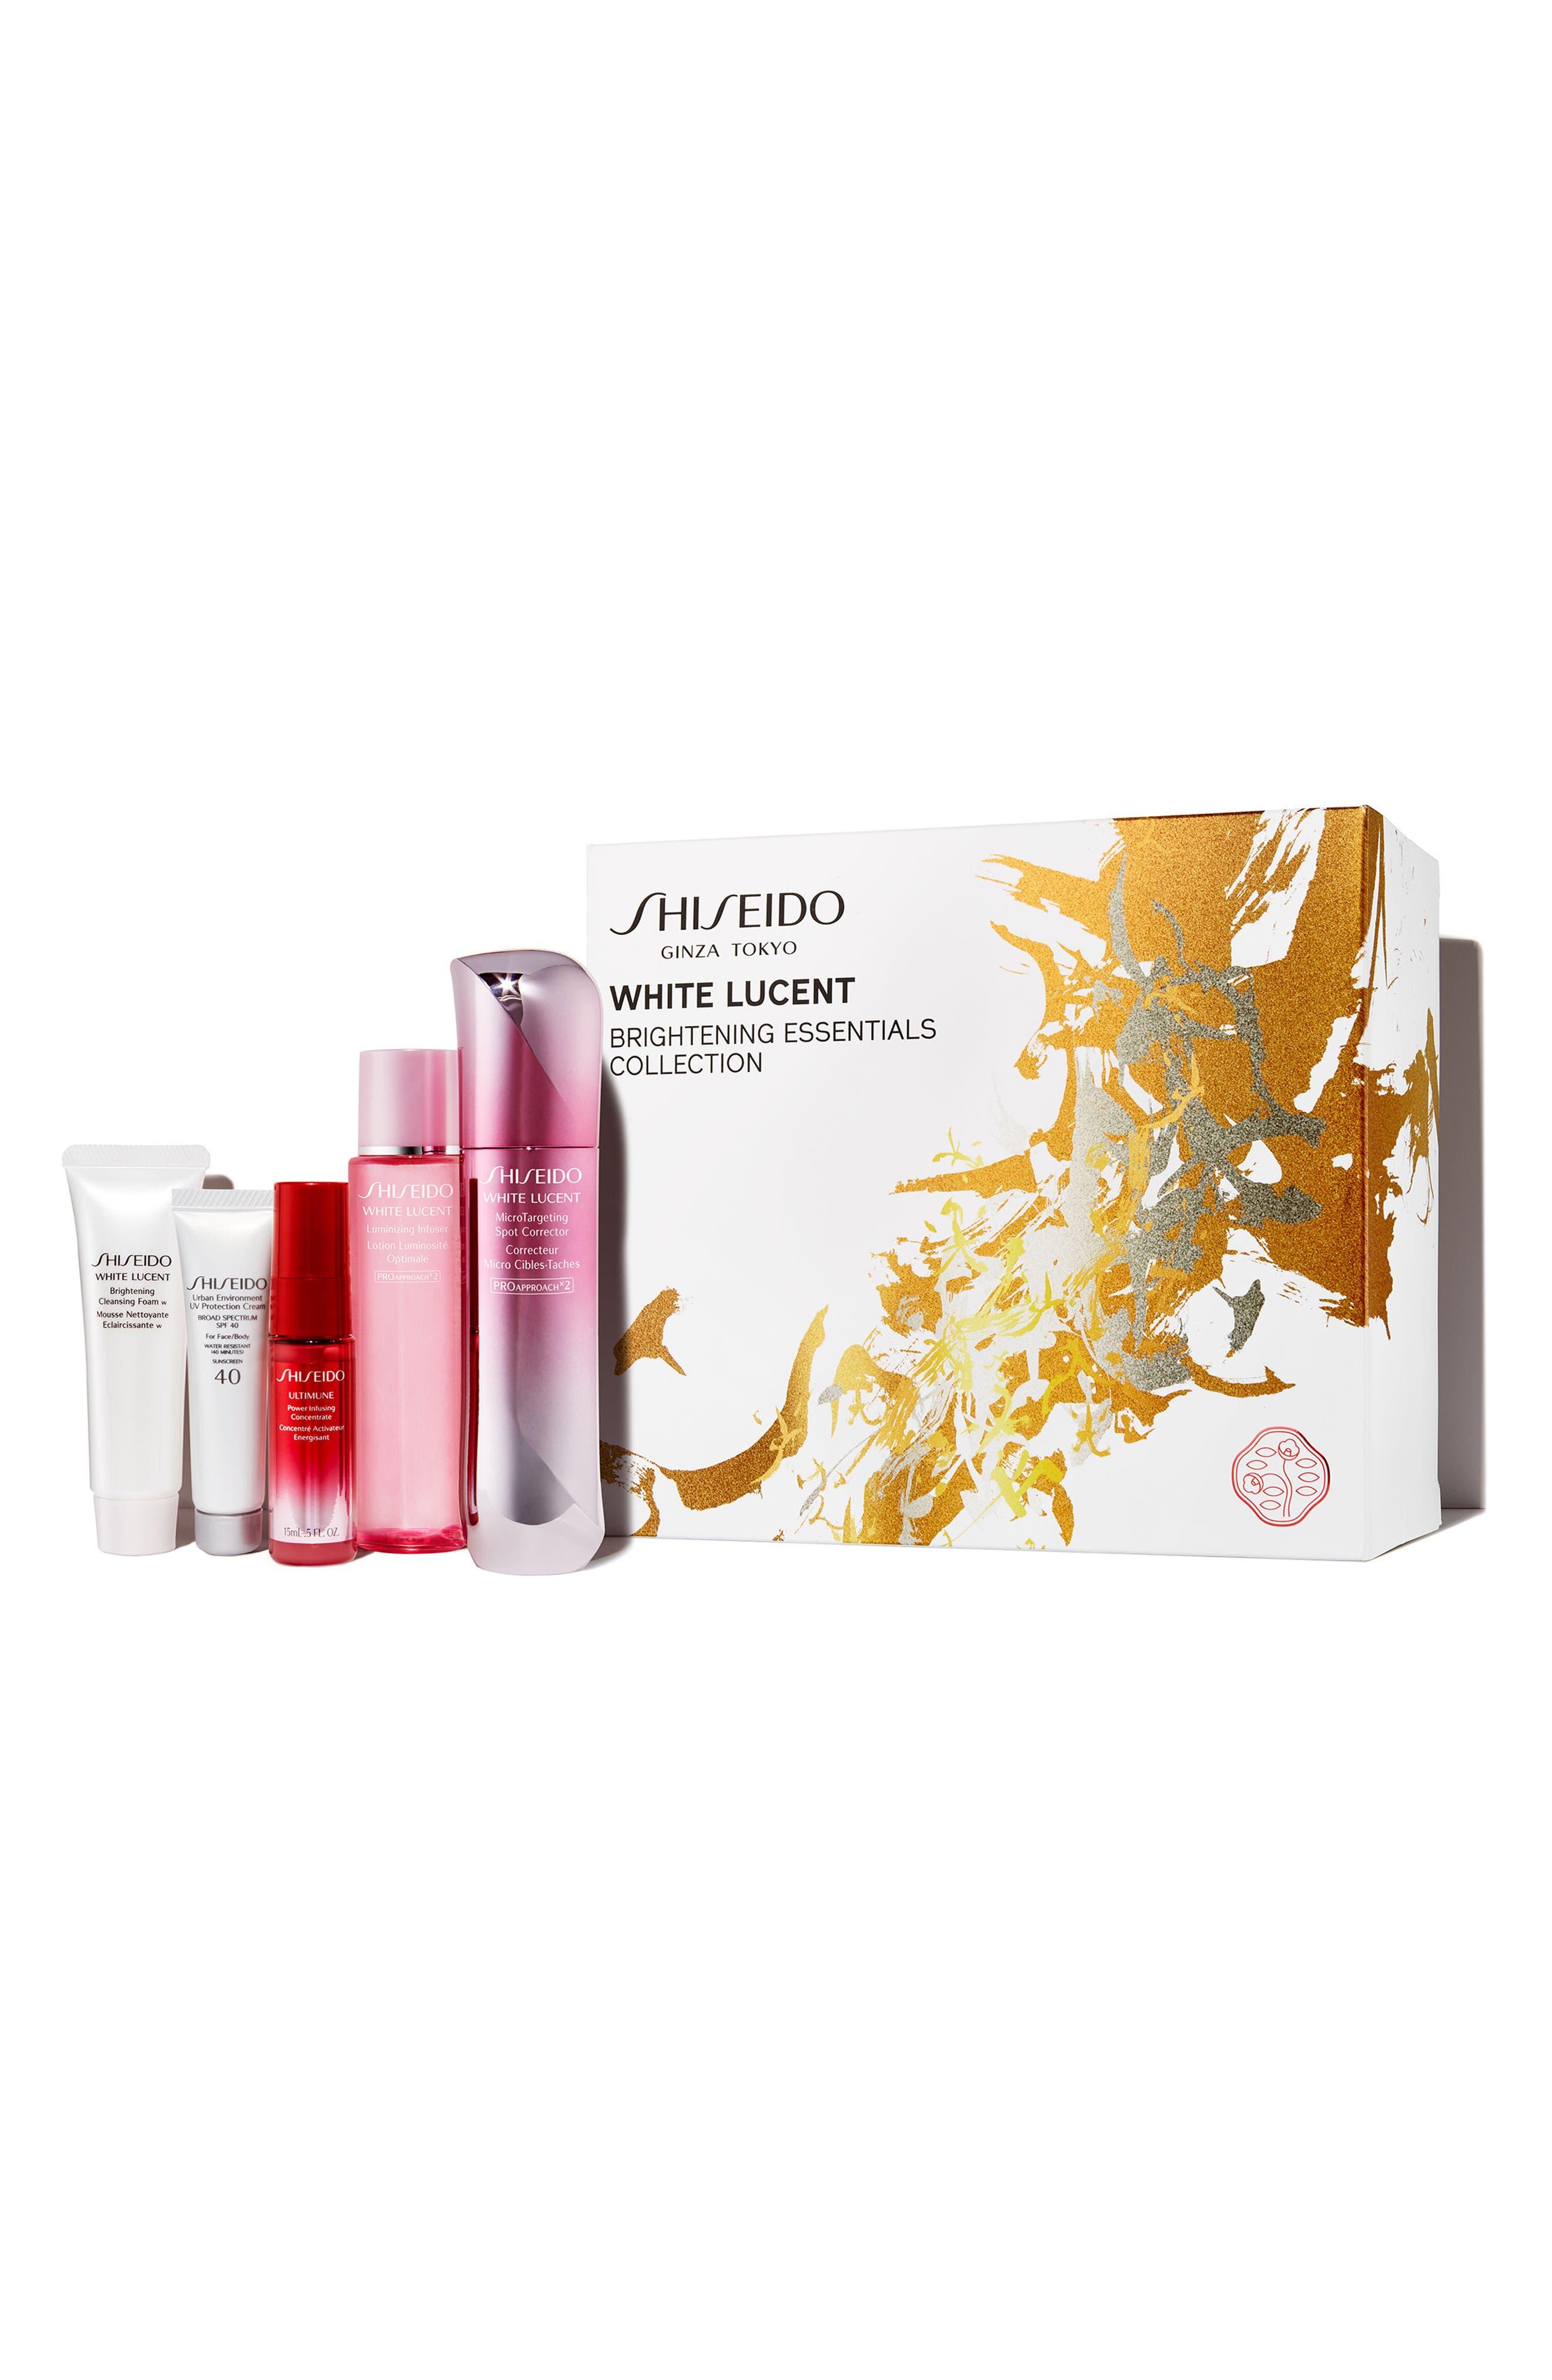 Shiseido Brightening Essentials Collection ($255 Value)